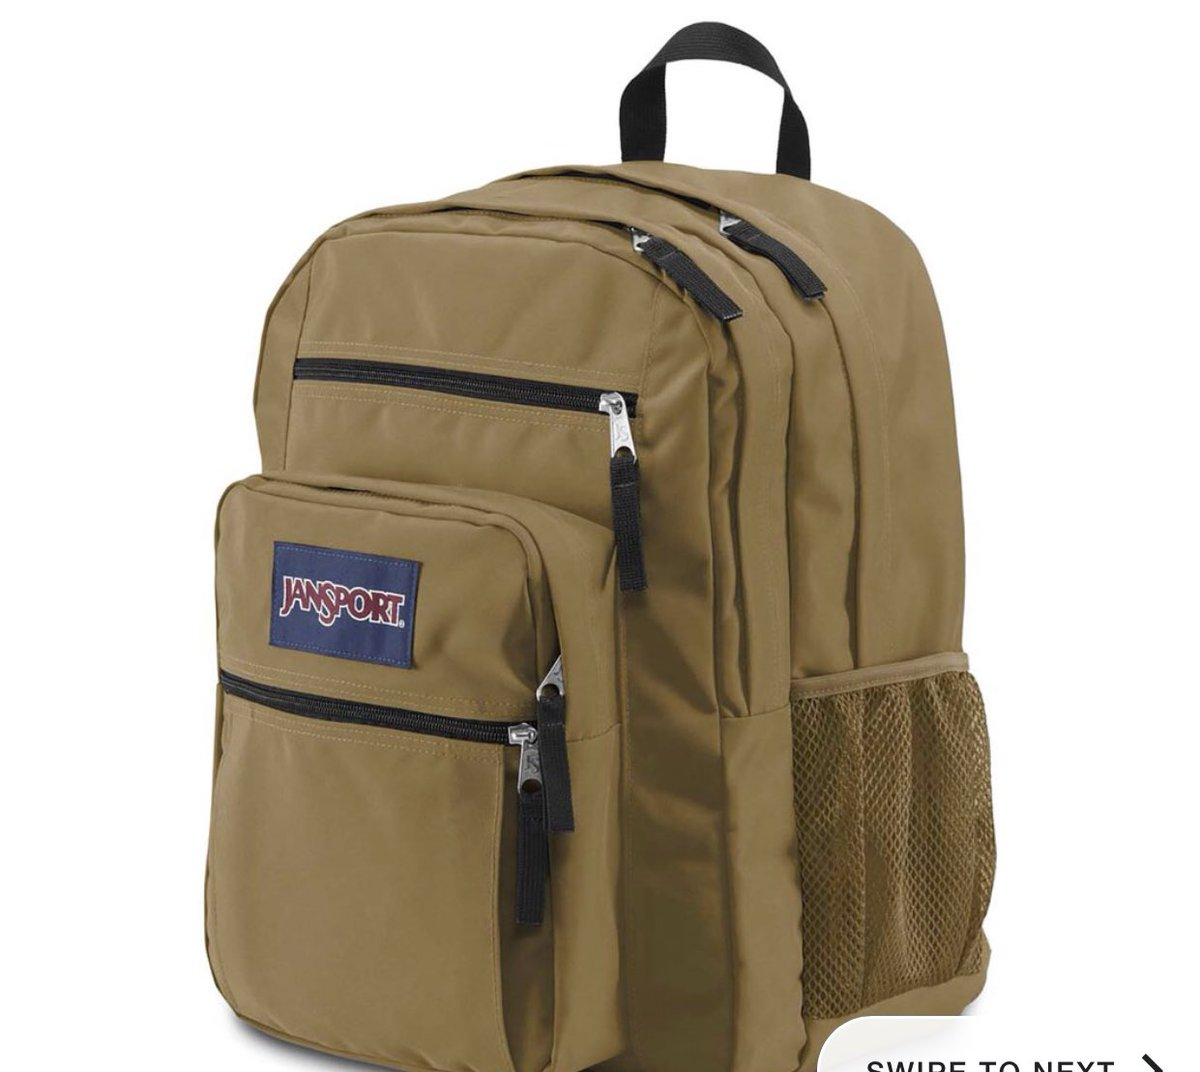 Jansport Backpacks Big Student Amazon  17a04c879fffb